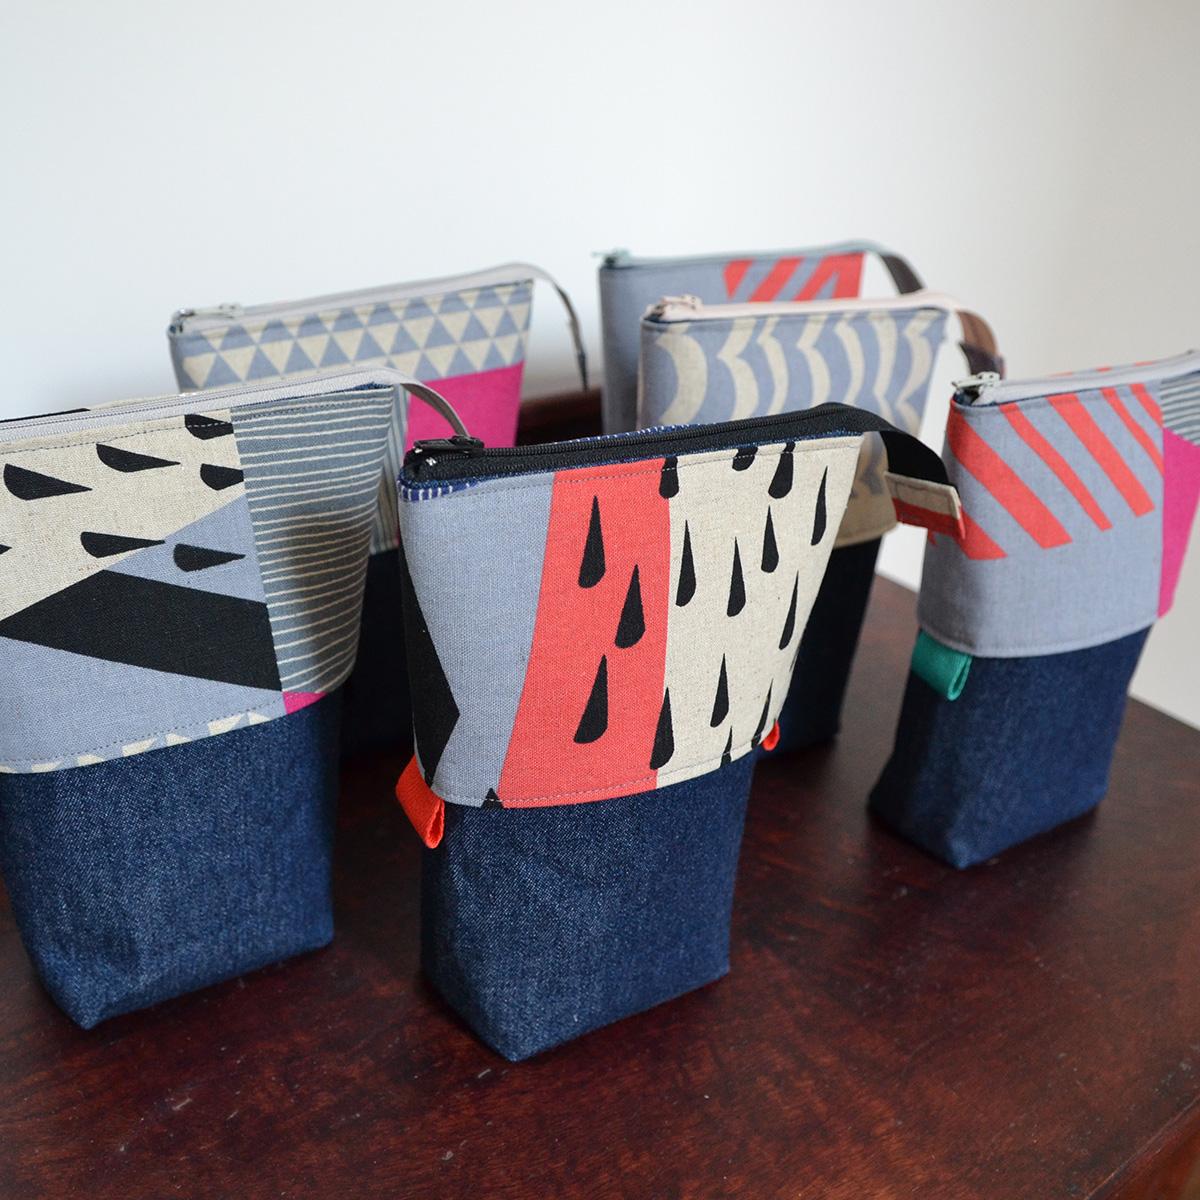 Slide Pencil Cases